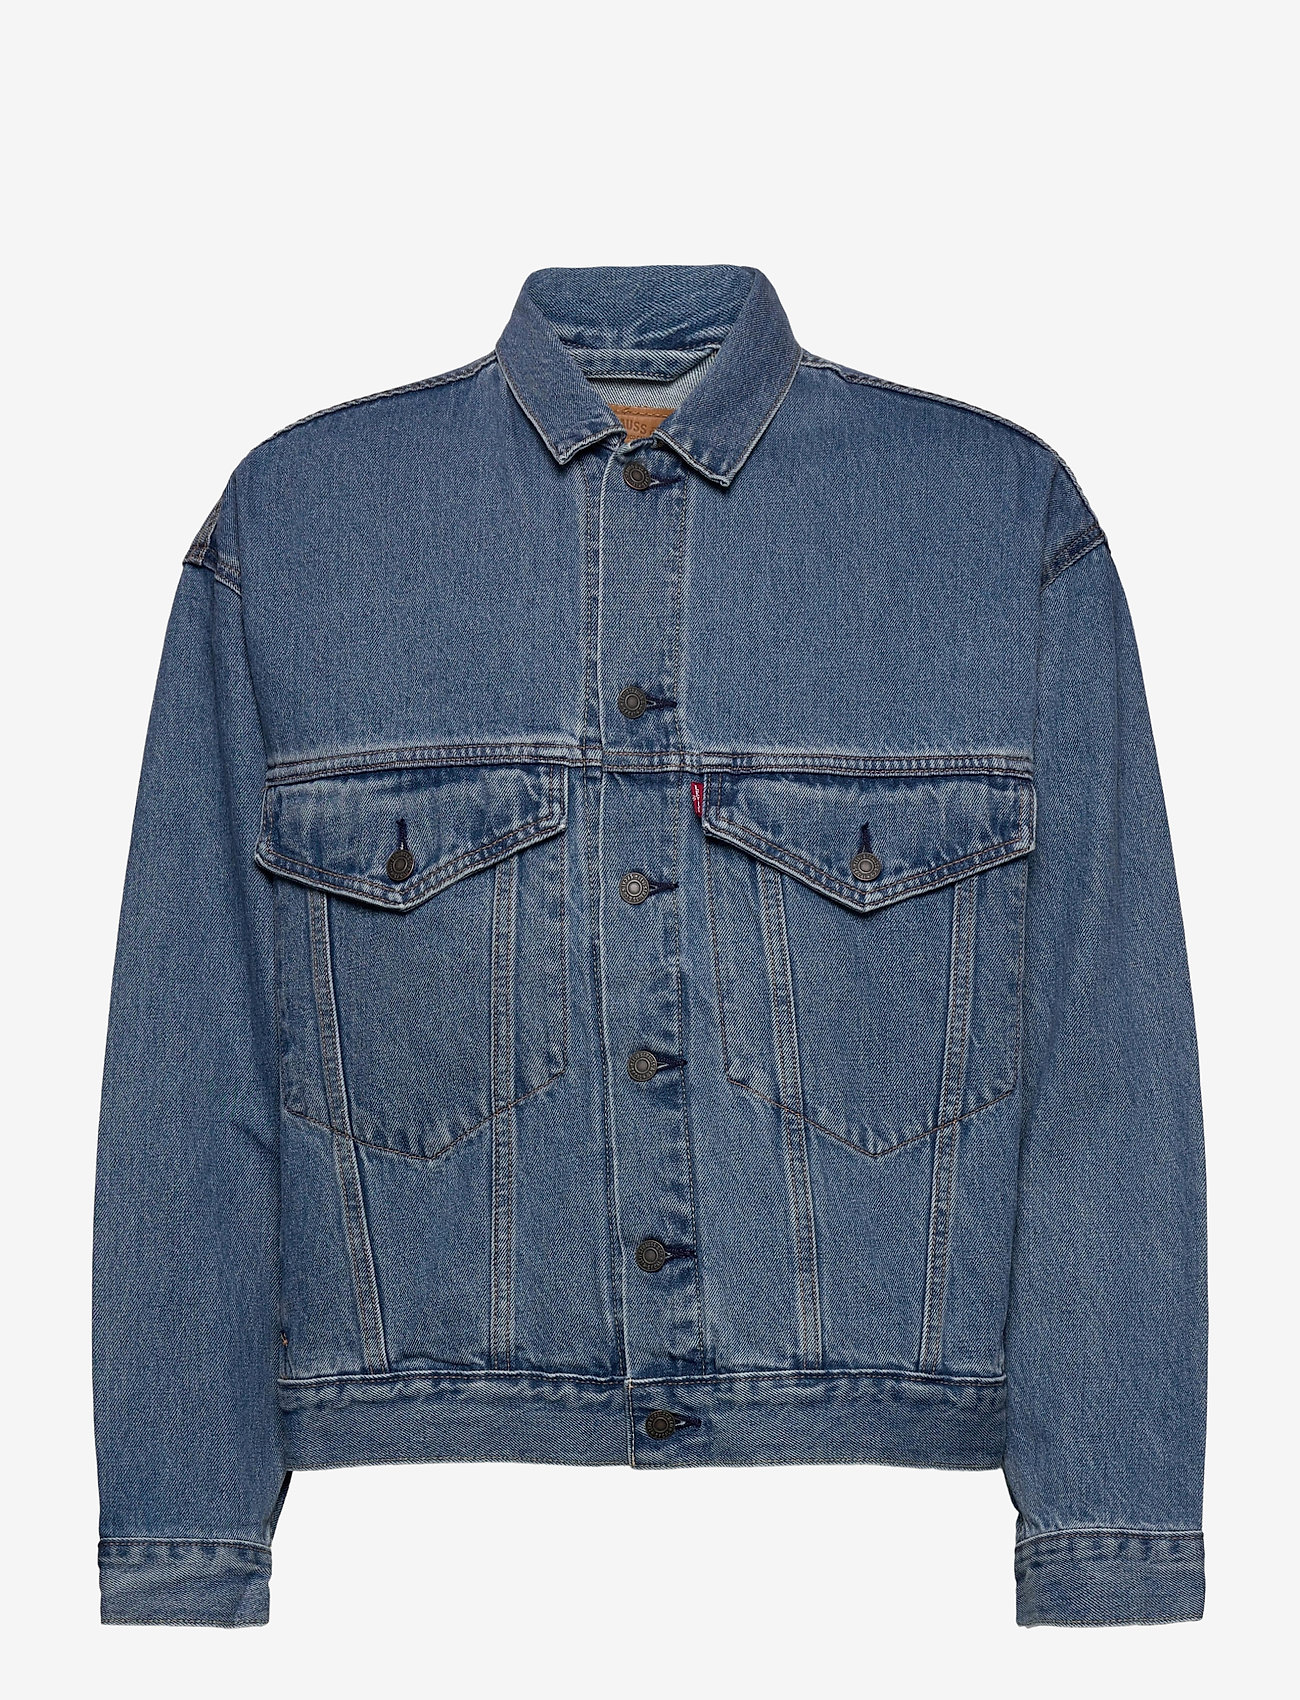 LEVI´S Men - STAY LOOSE TRUCKER HANG LOOSE - denim jackets - light indigo - worn in - 1